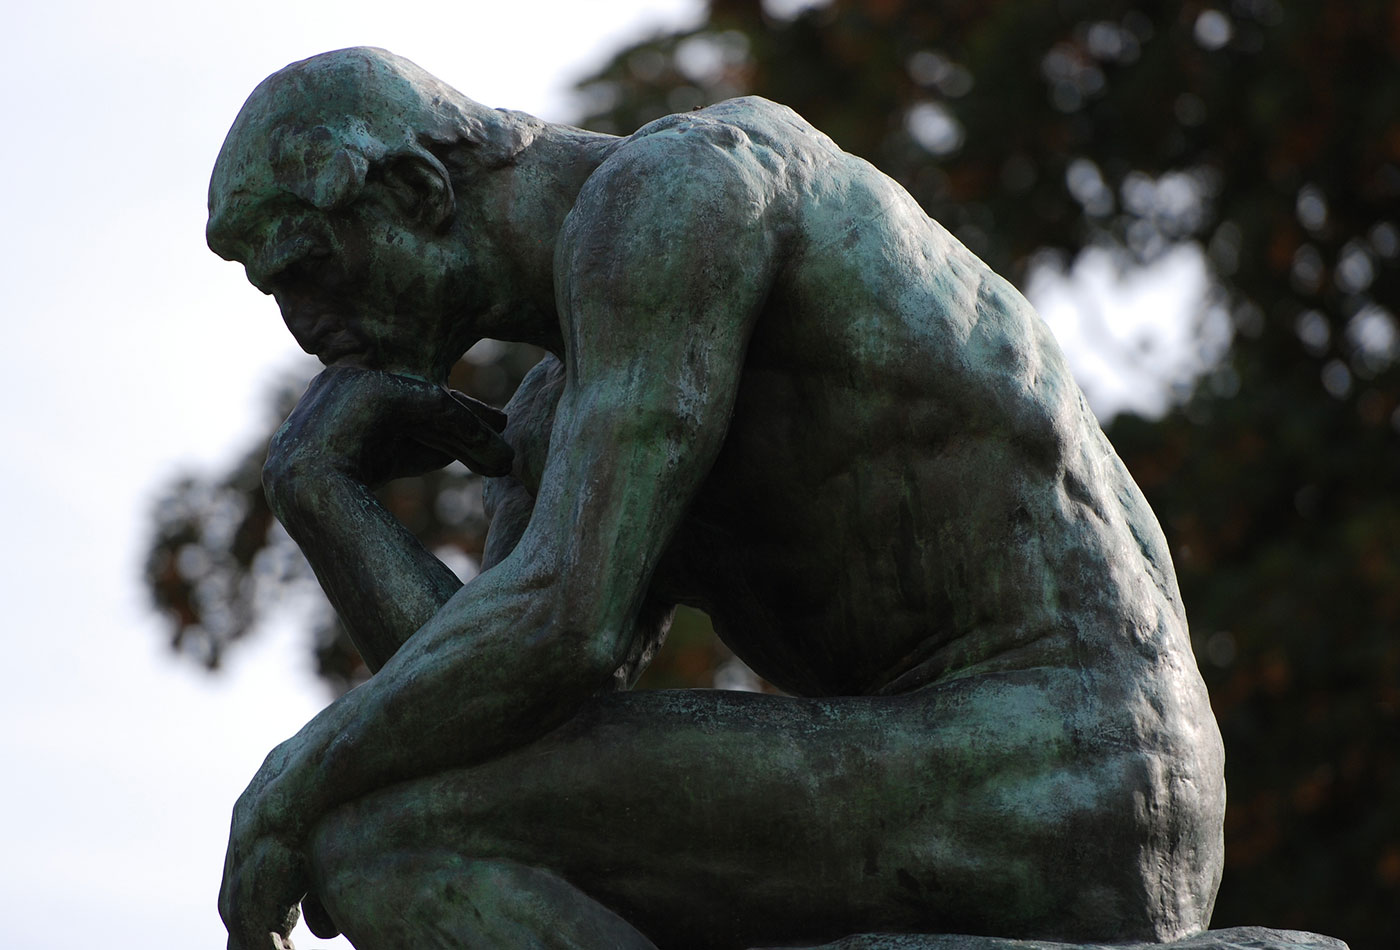 The Thinker, Musée Rodin.